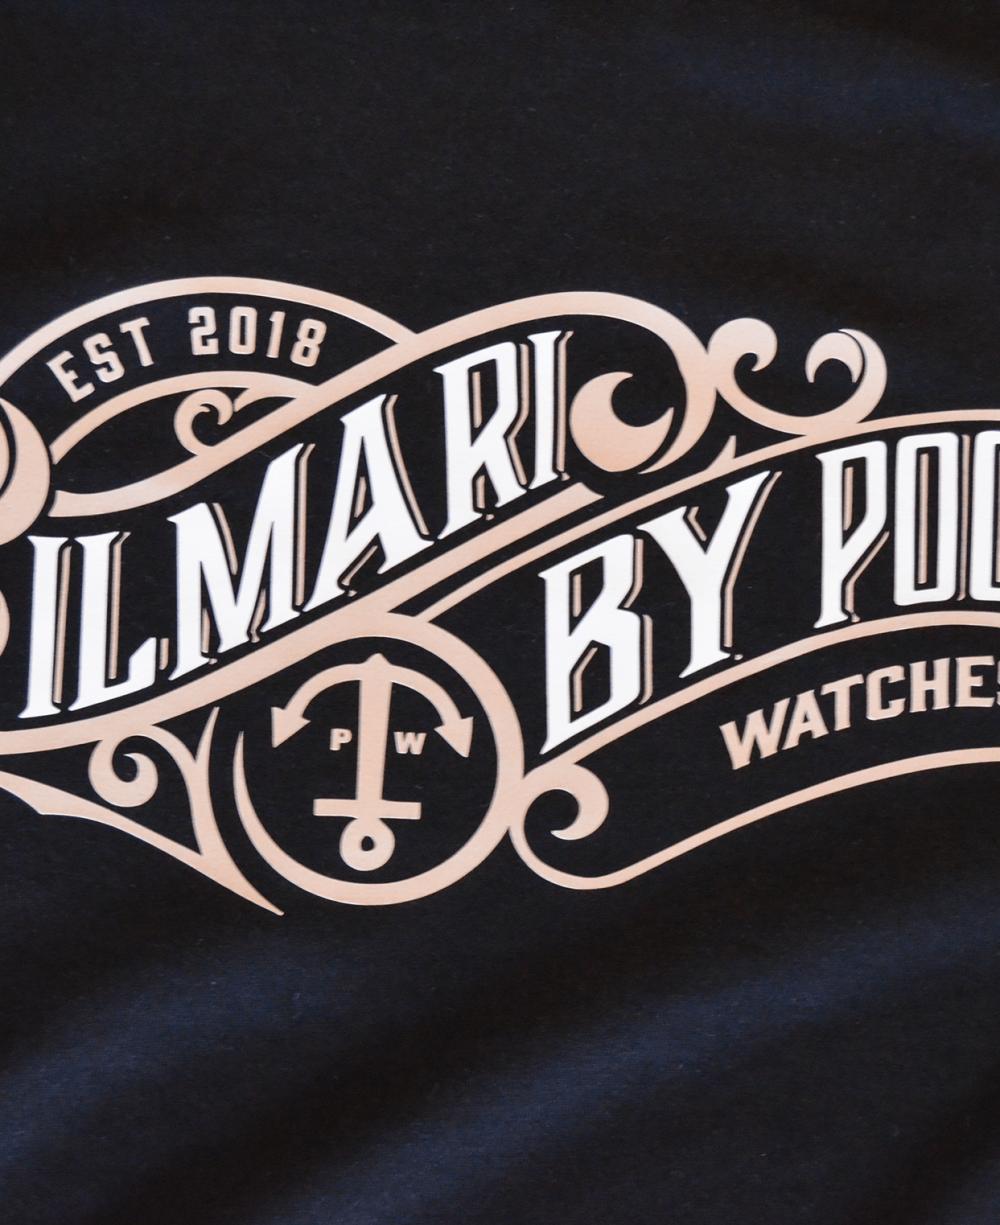 pookwatches.com Ilmari